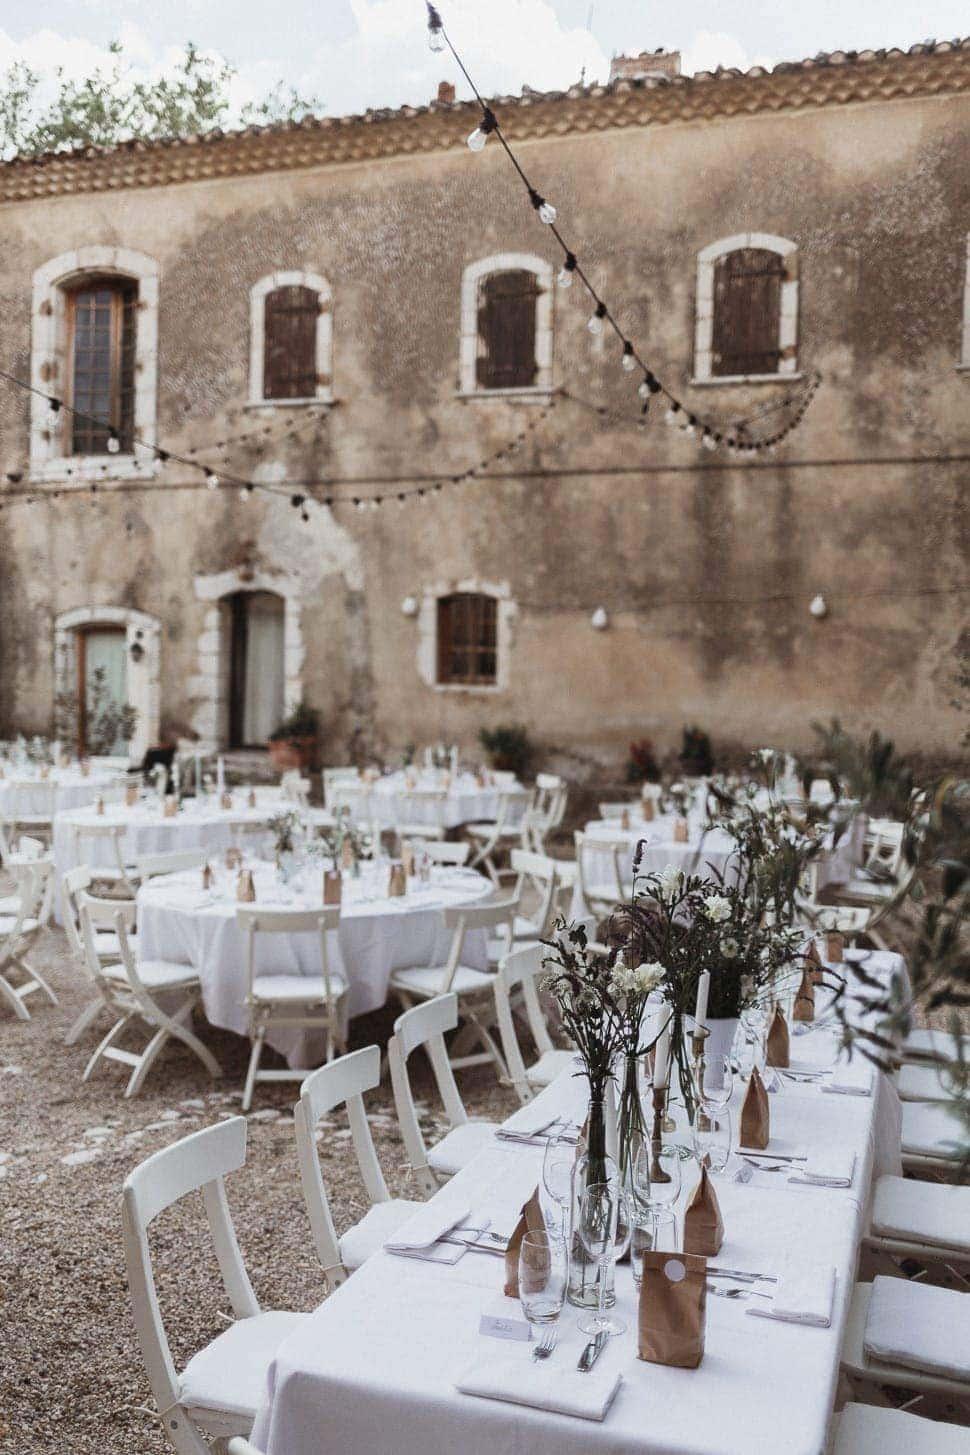 mariage simple et familial marseille luberon provence